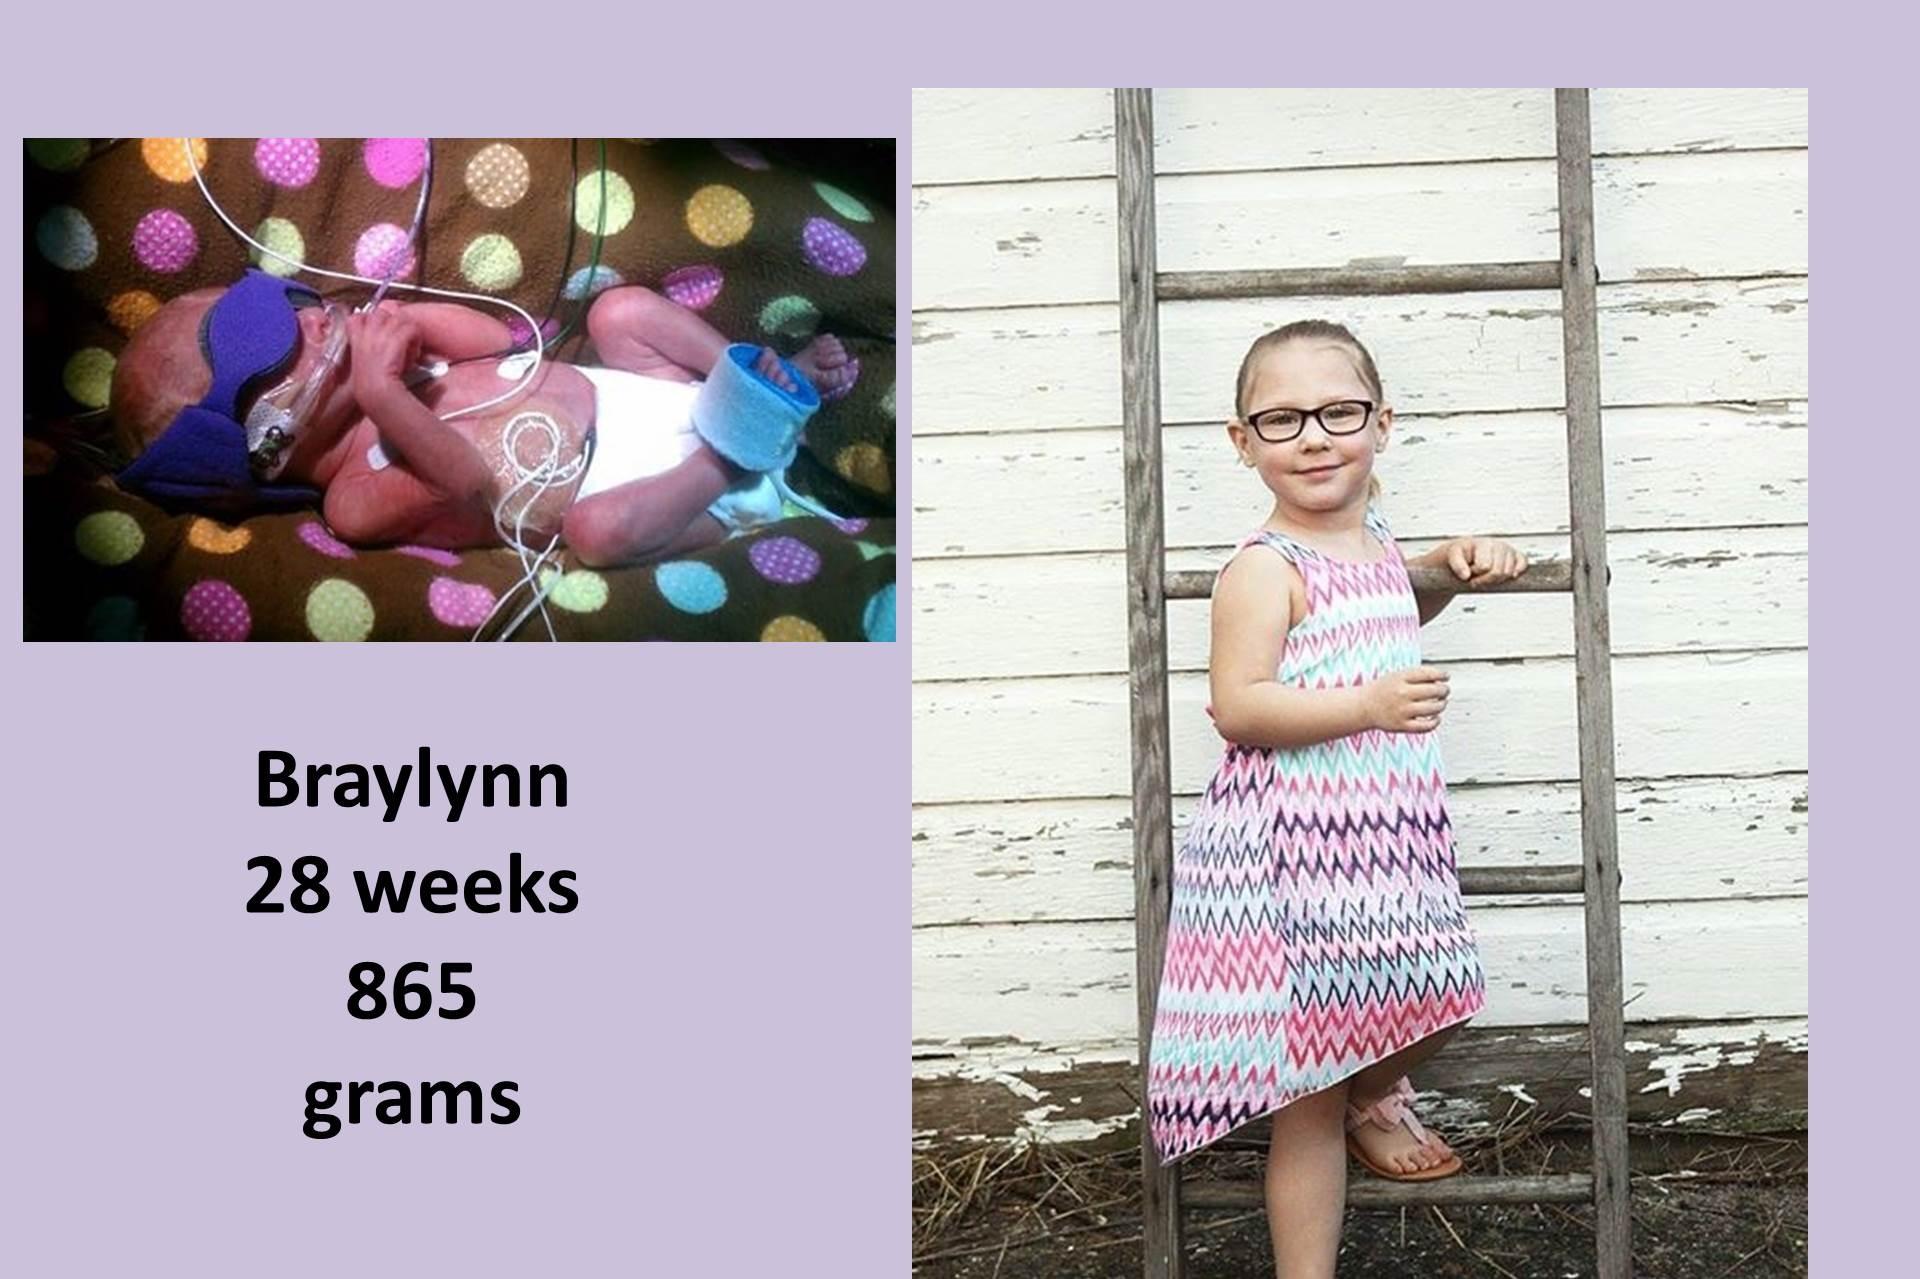 Hallway of Hope: Braylynn